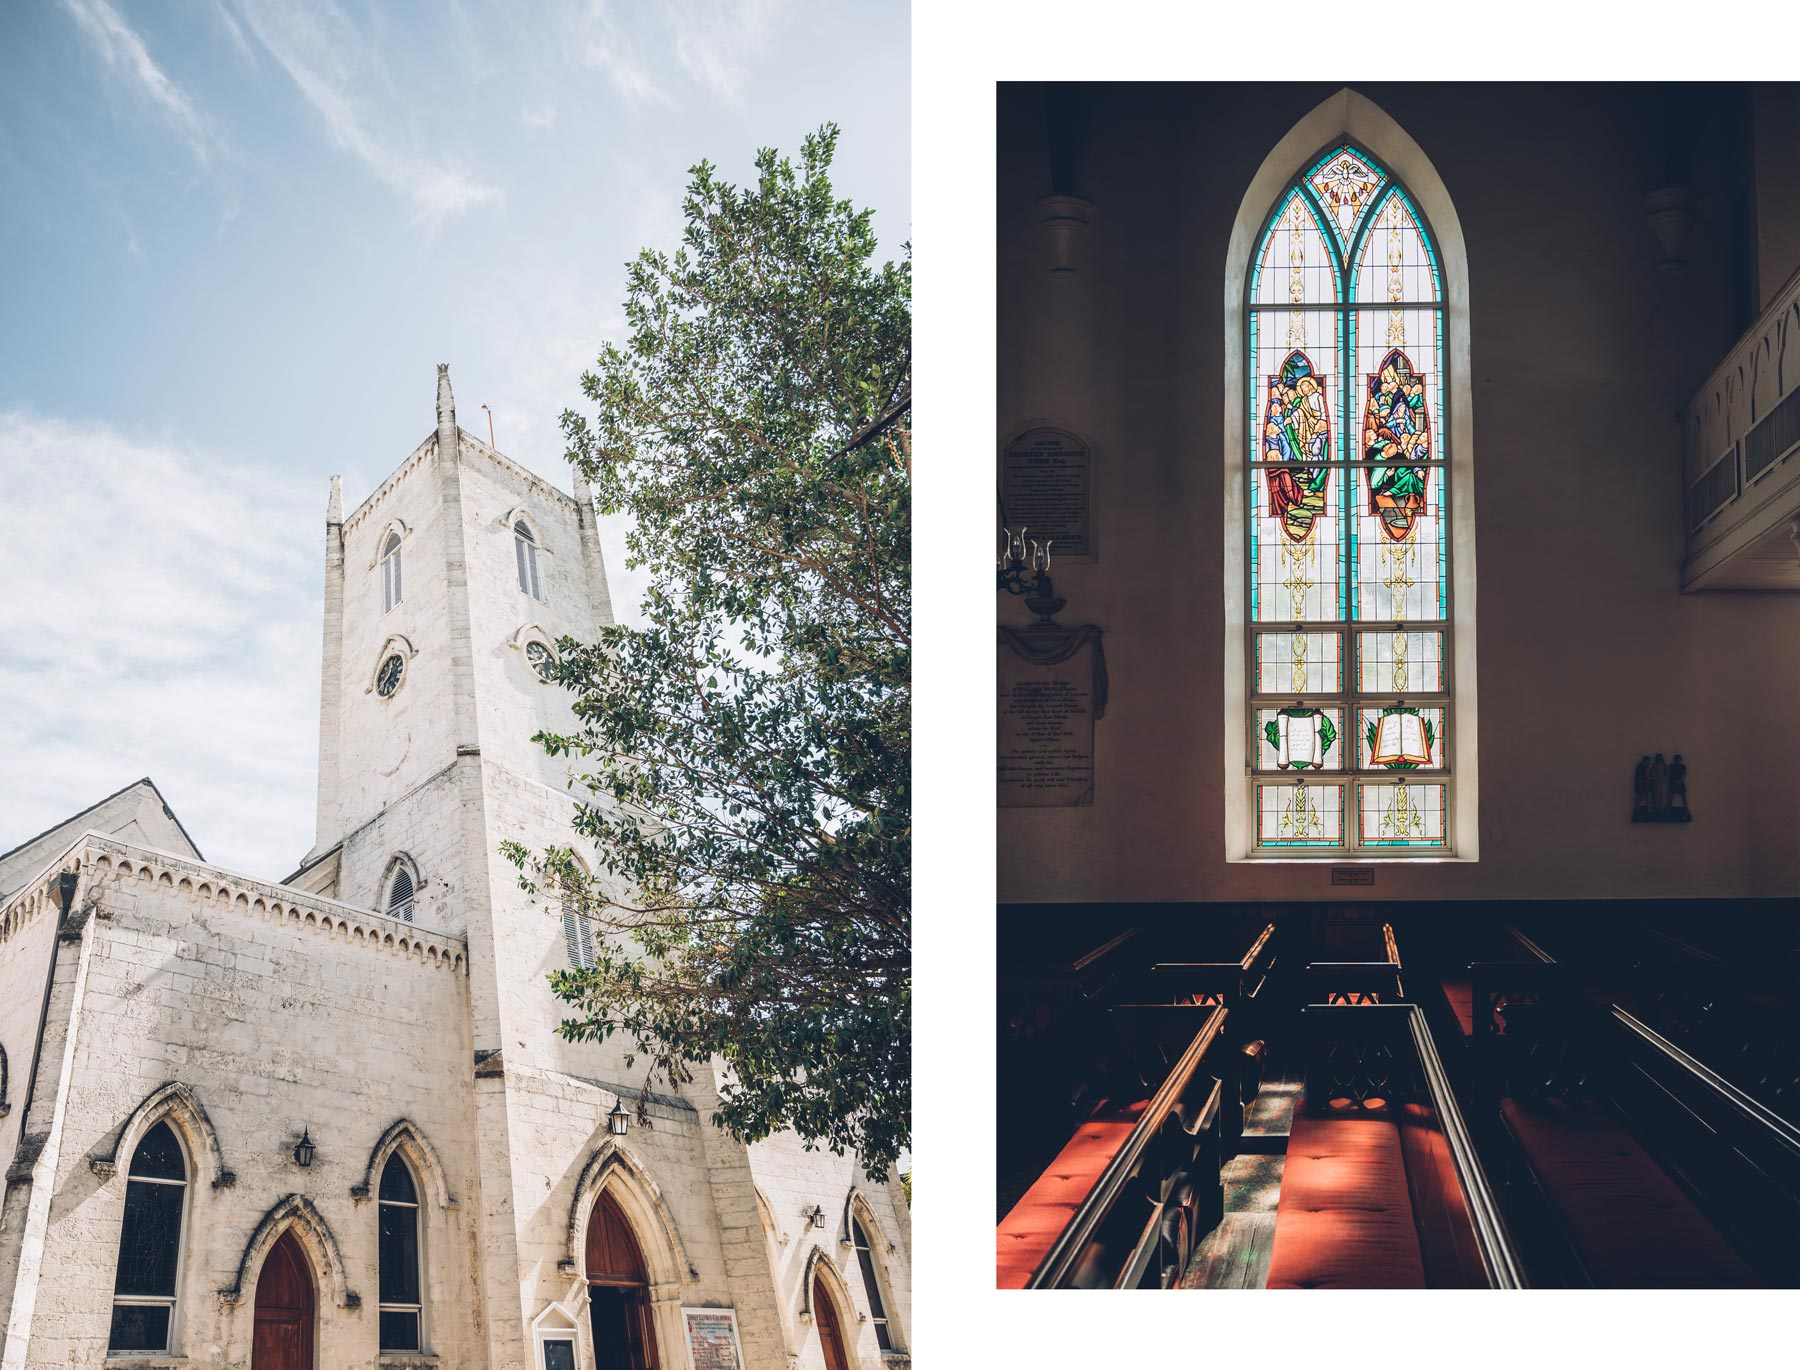 Cathédrale, Nassau, Bahamas